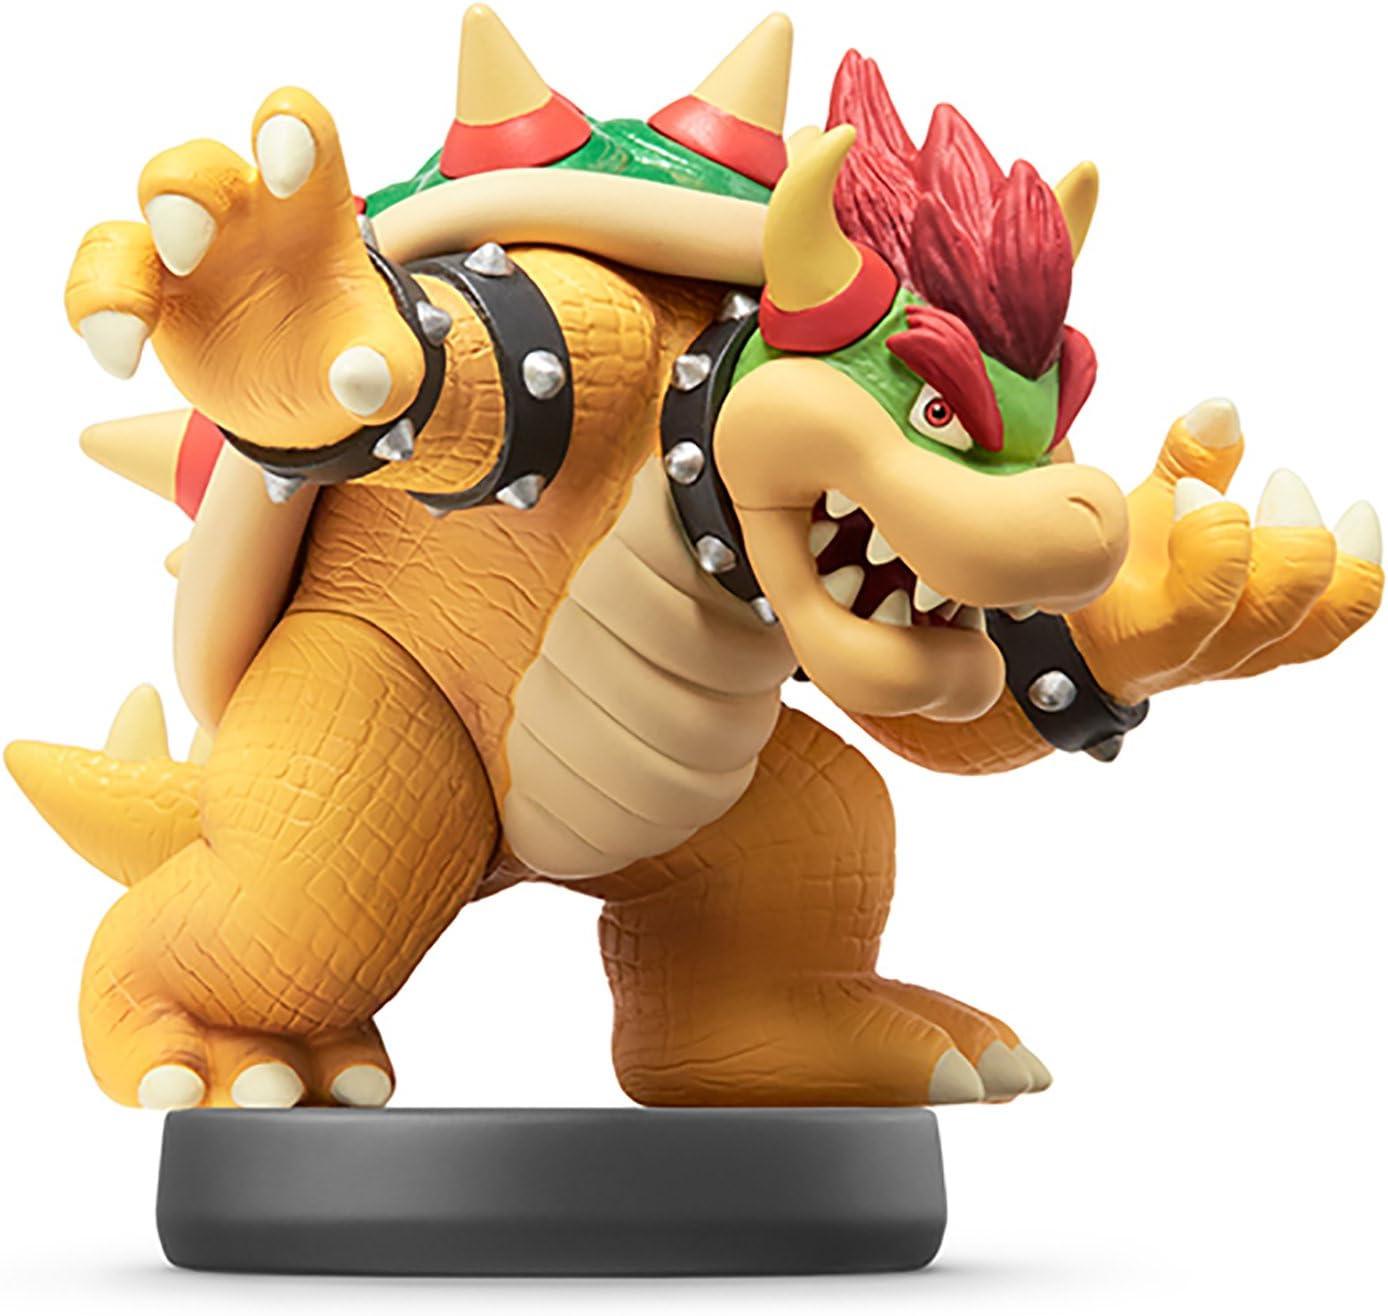 Nintendo Bowser Koopa amiibo - Japan Import - Super Smash Bros Series - Switch